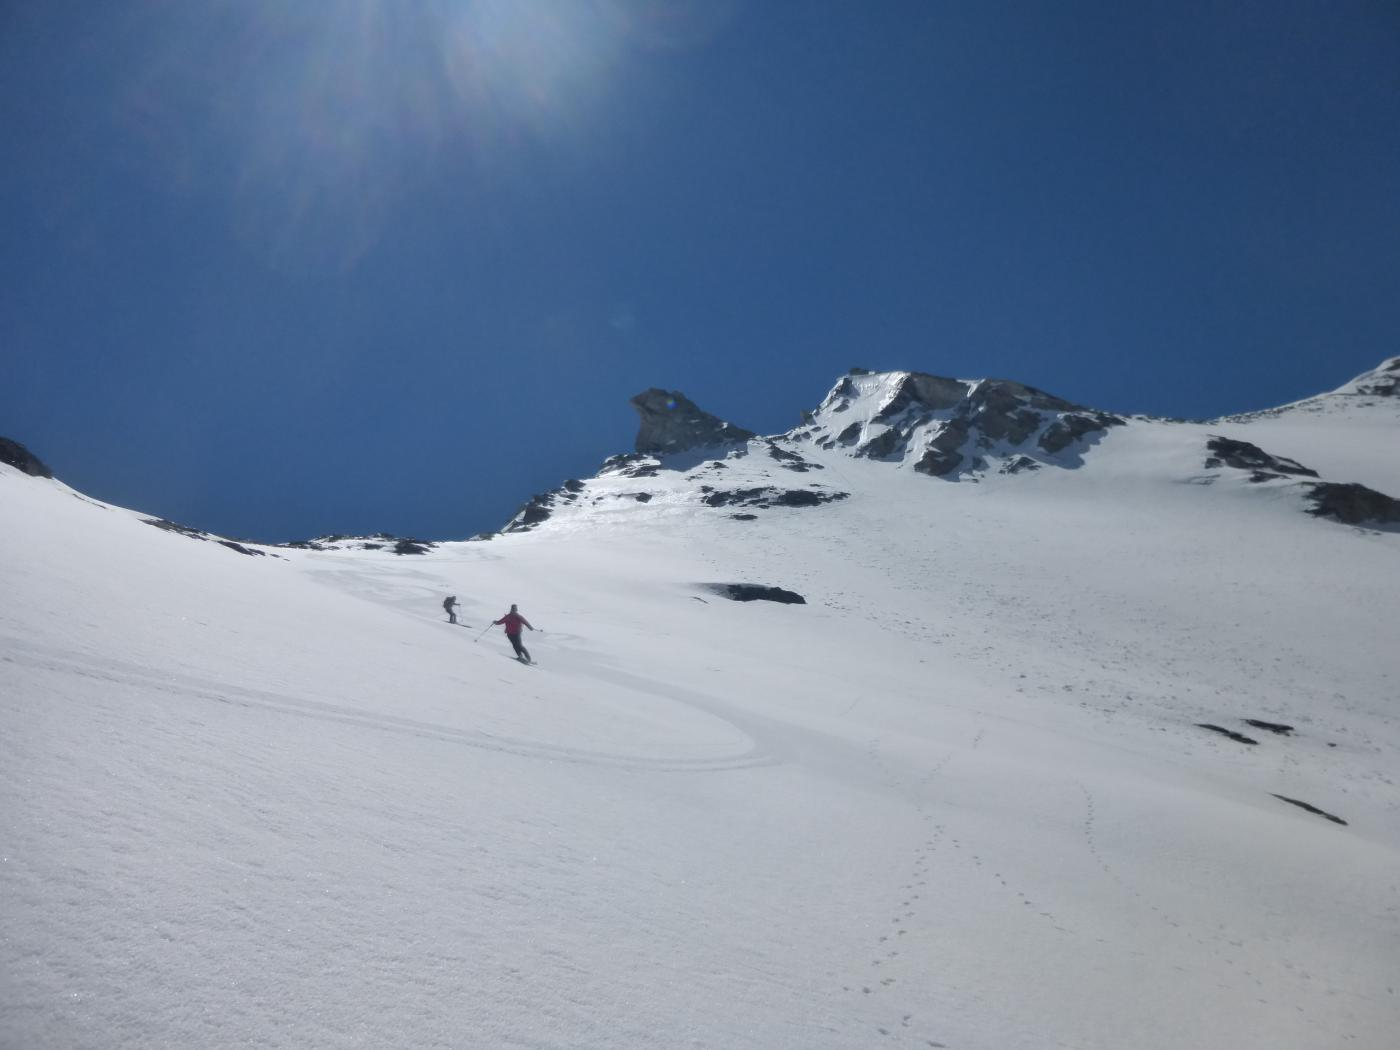 ..bella neve sui pendii superiori...